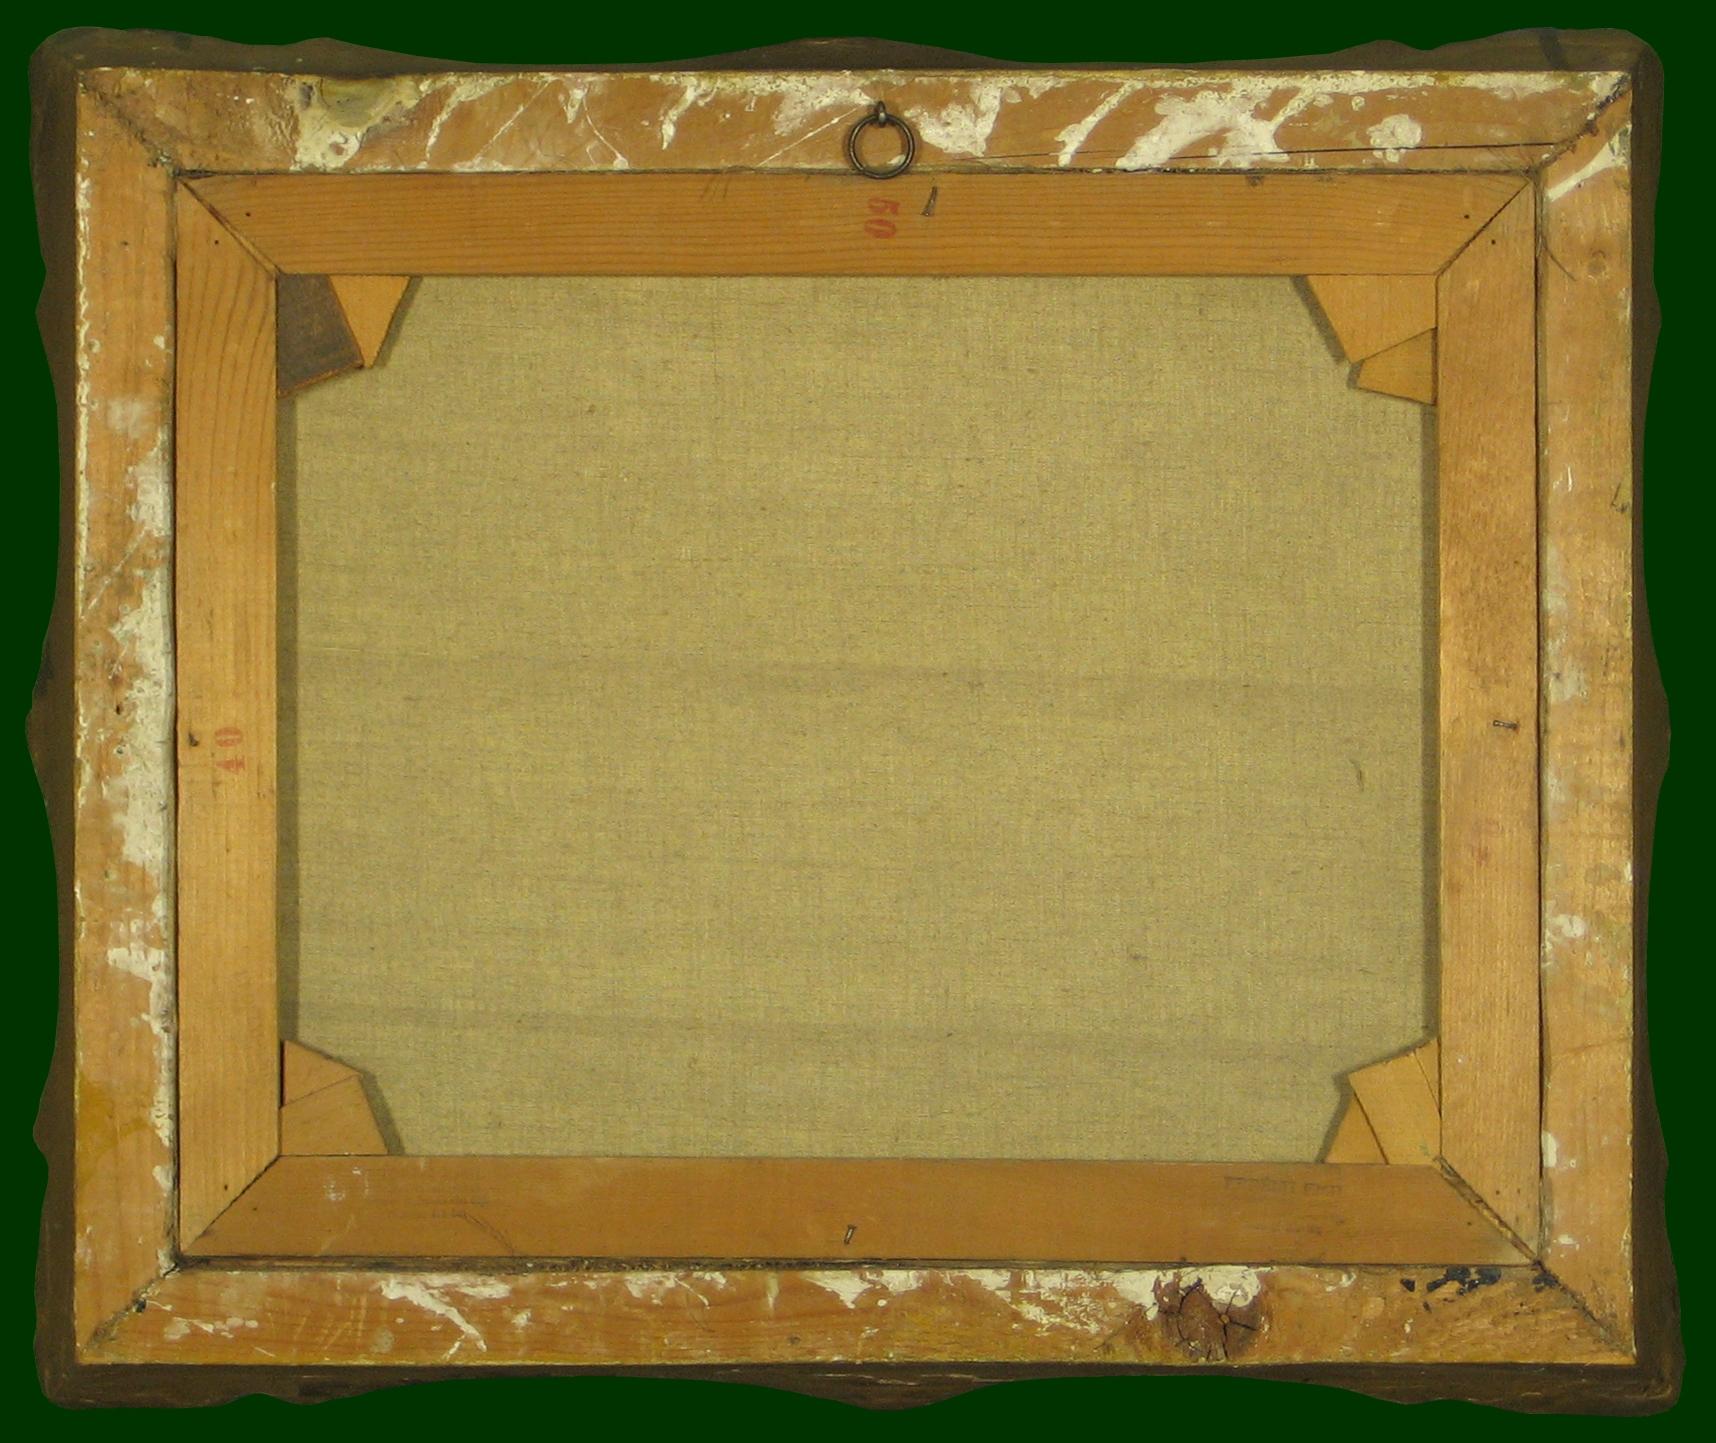 45-13h_t.jpg (1716×1443)